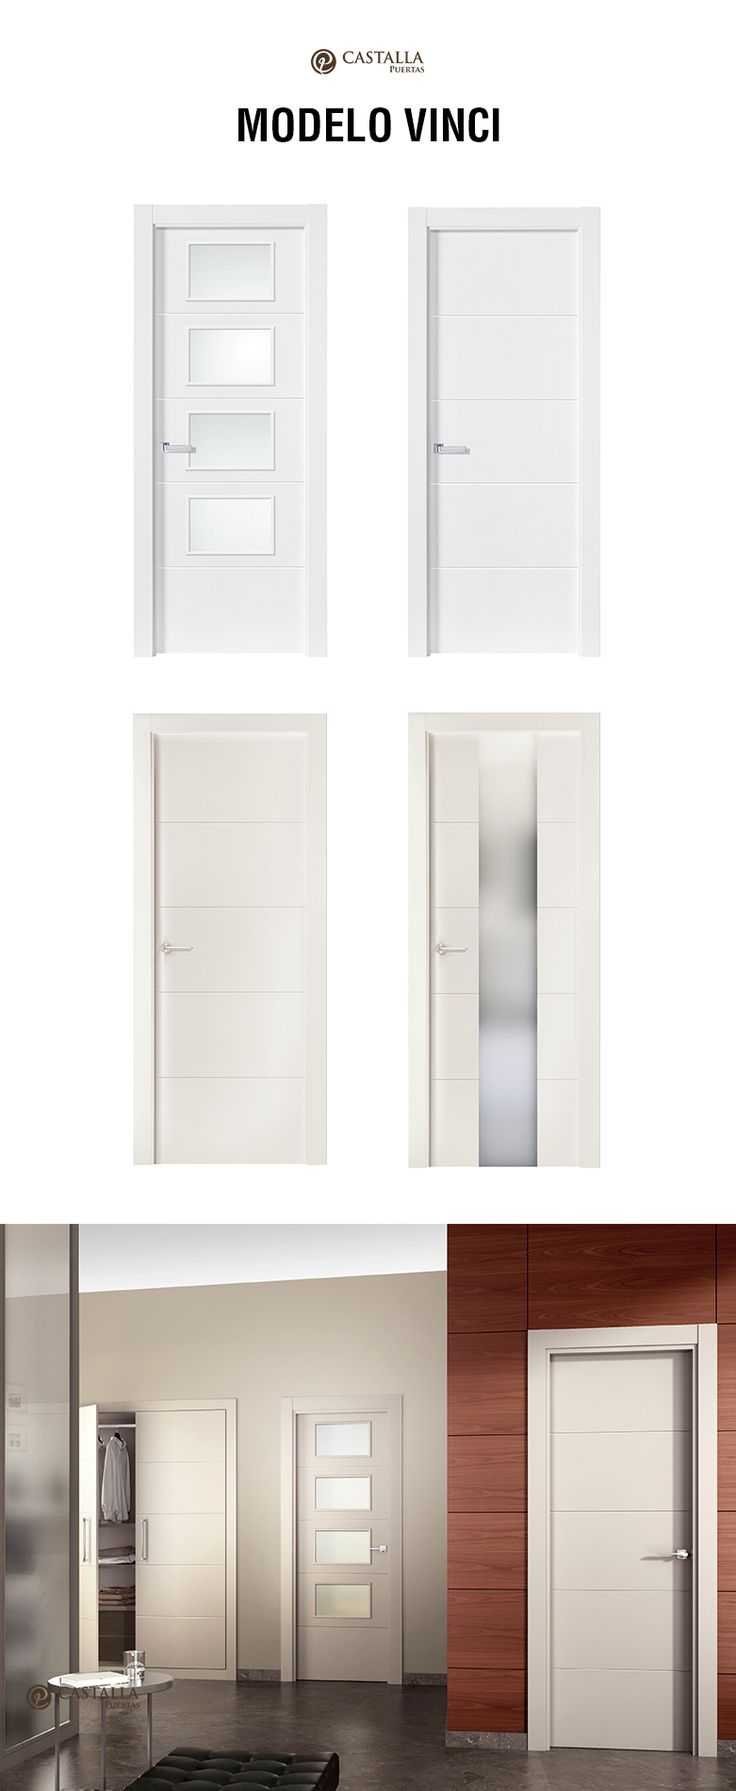 puerta de interior con cristal modelo vinci puertas castalla para ms informacin escribenos a